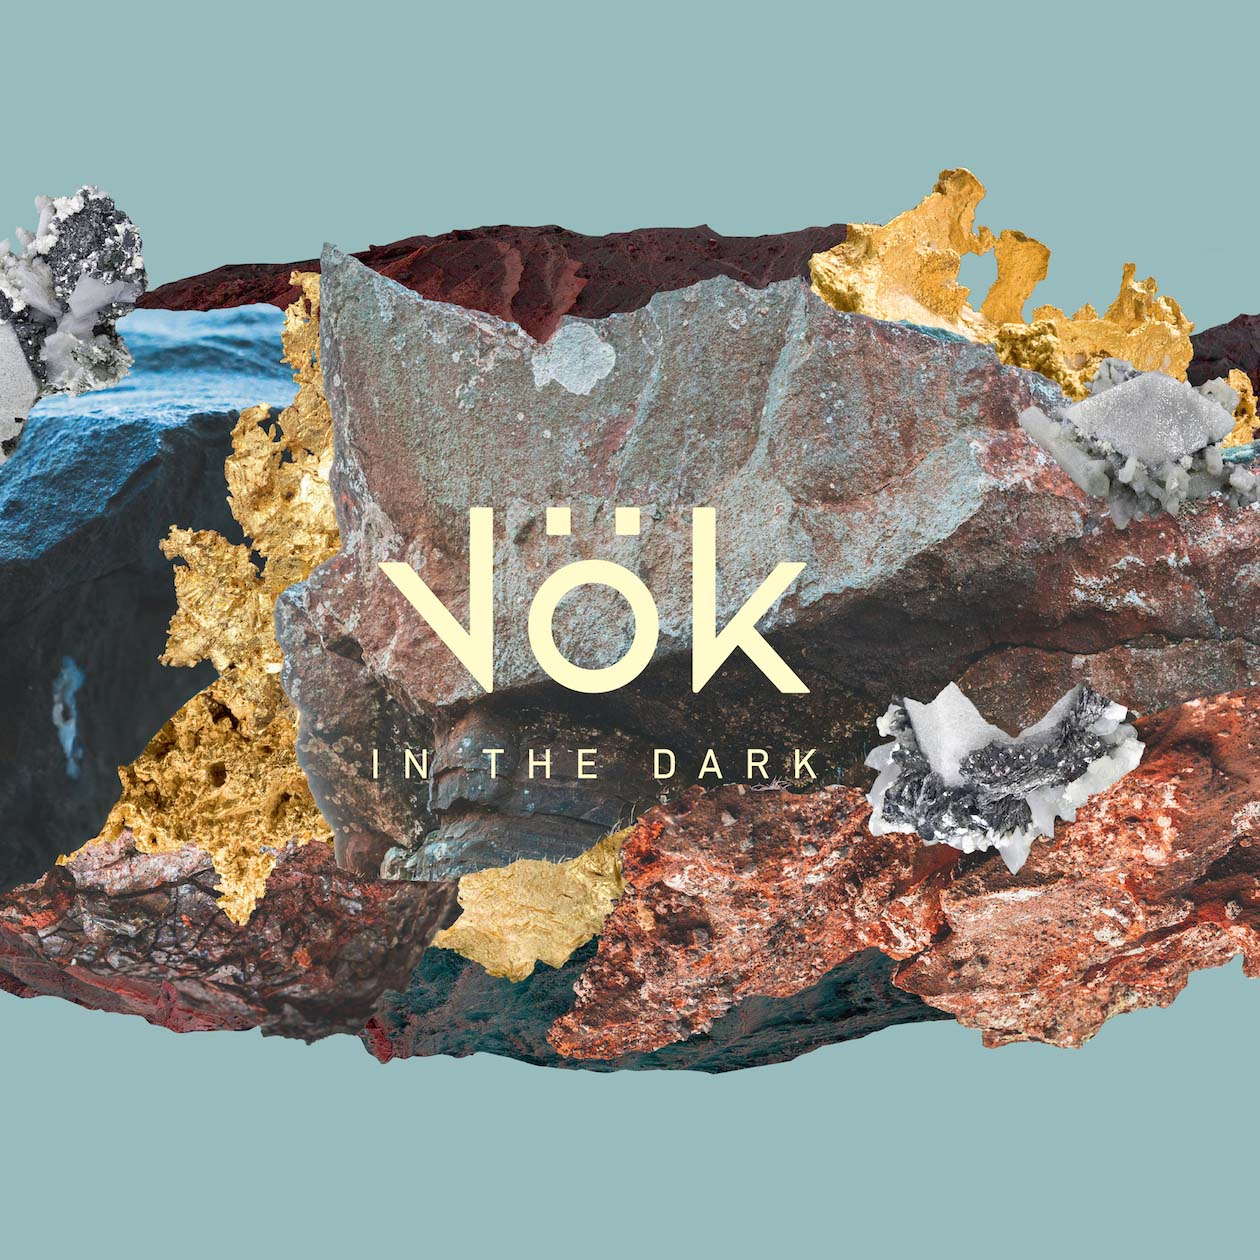 Vok_InTheDark_3600-packshot